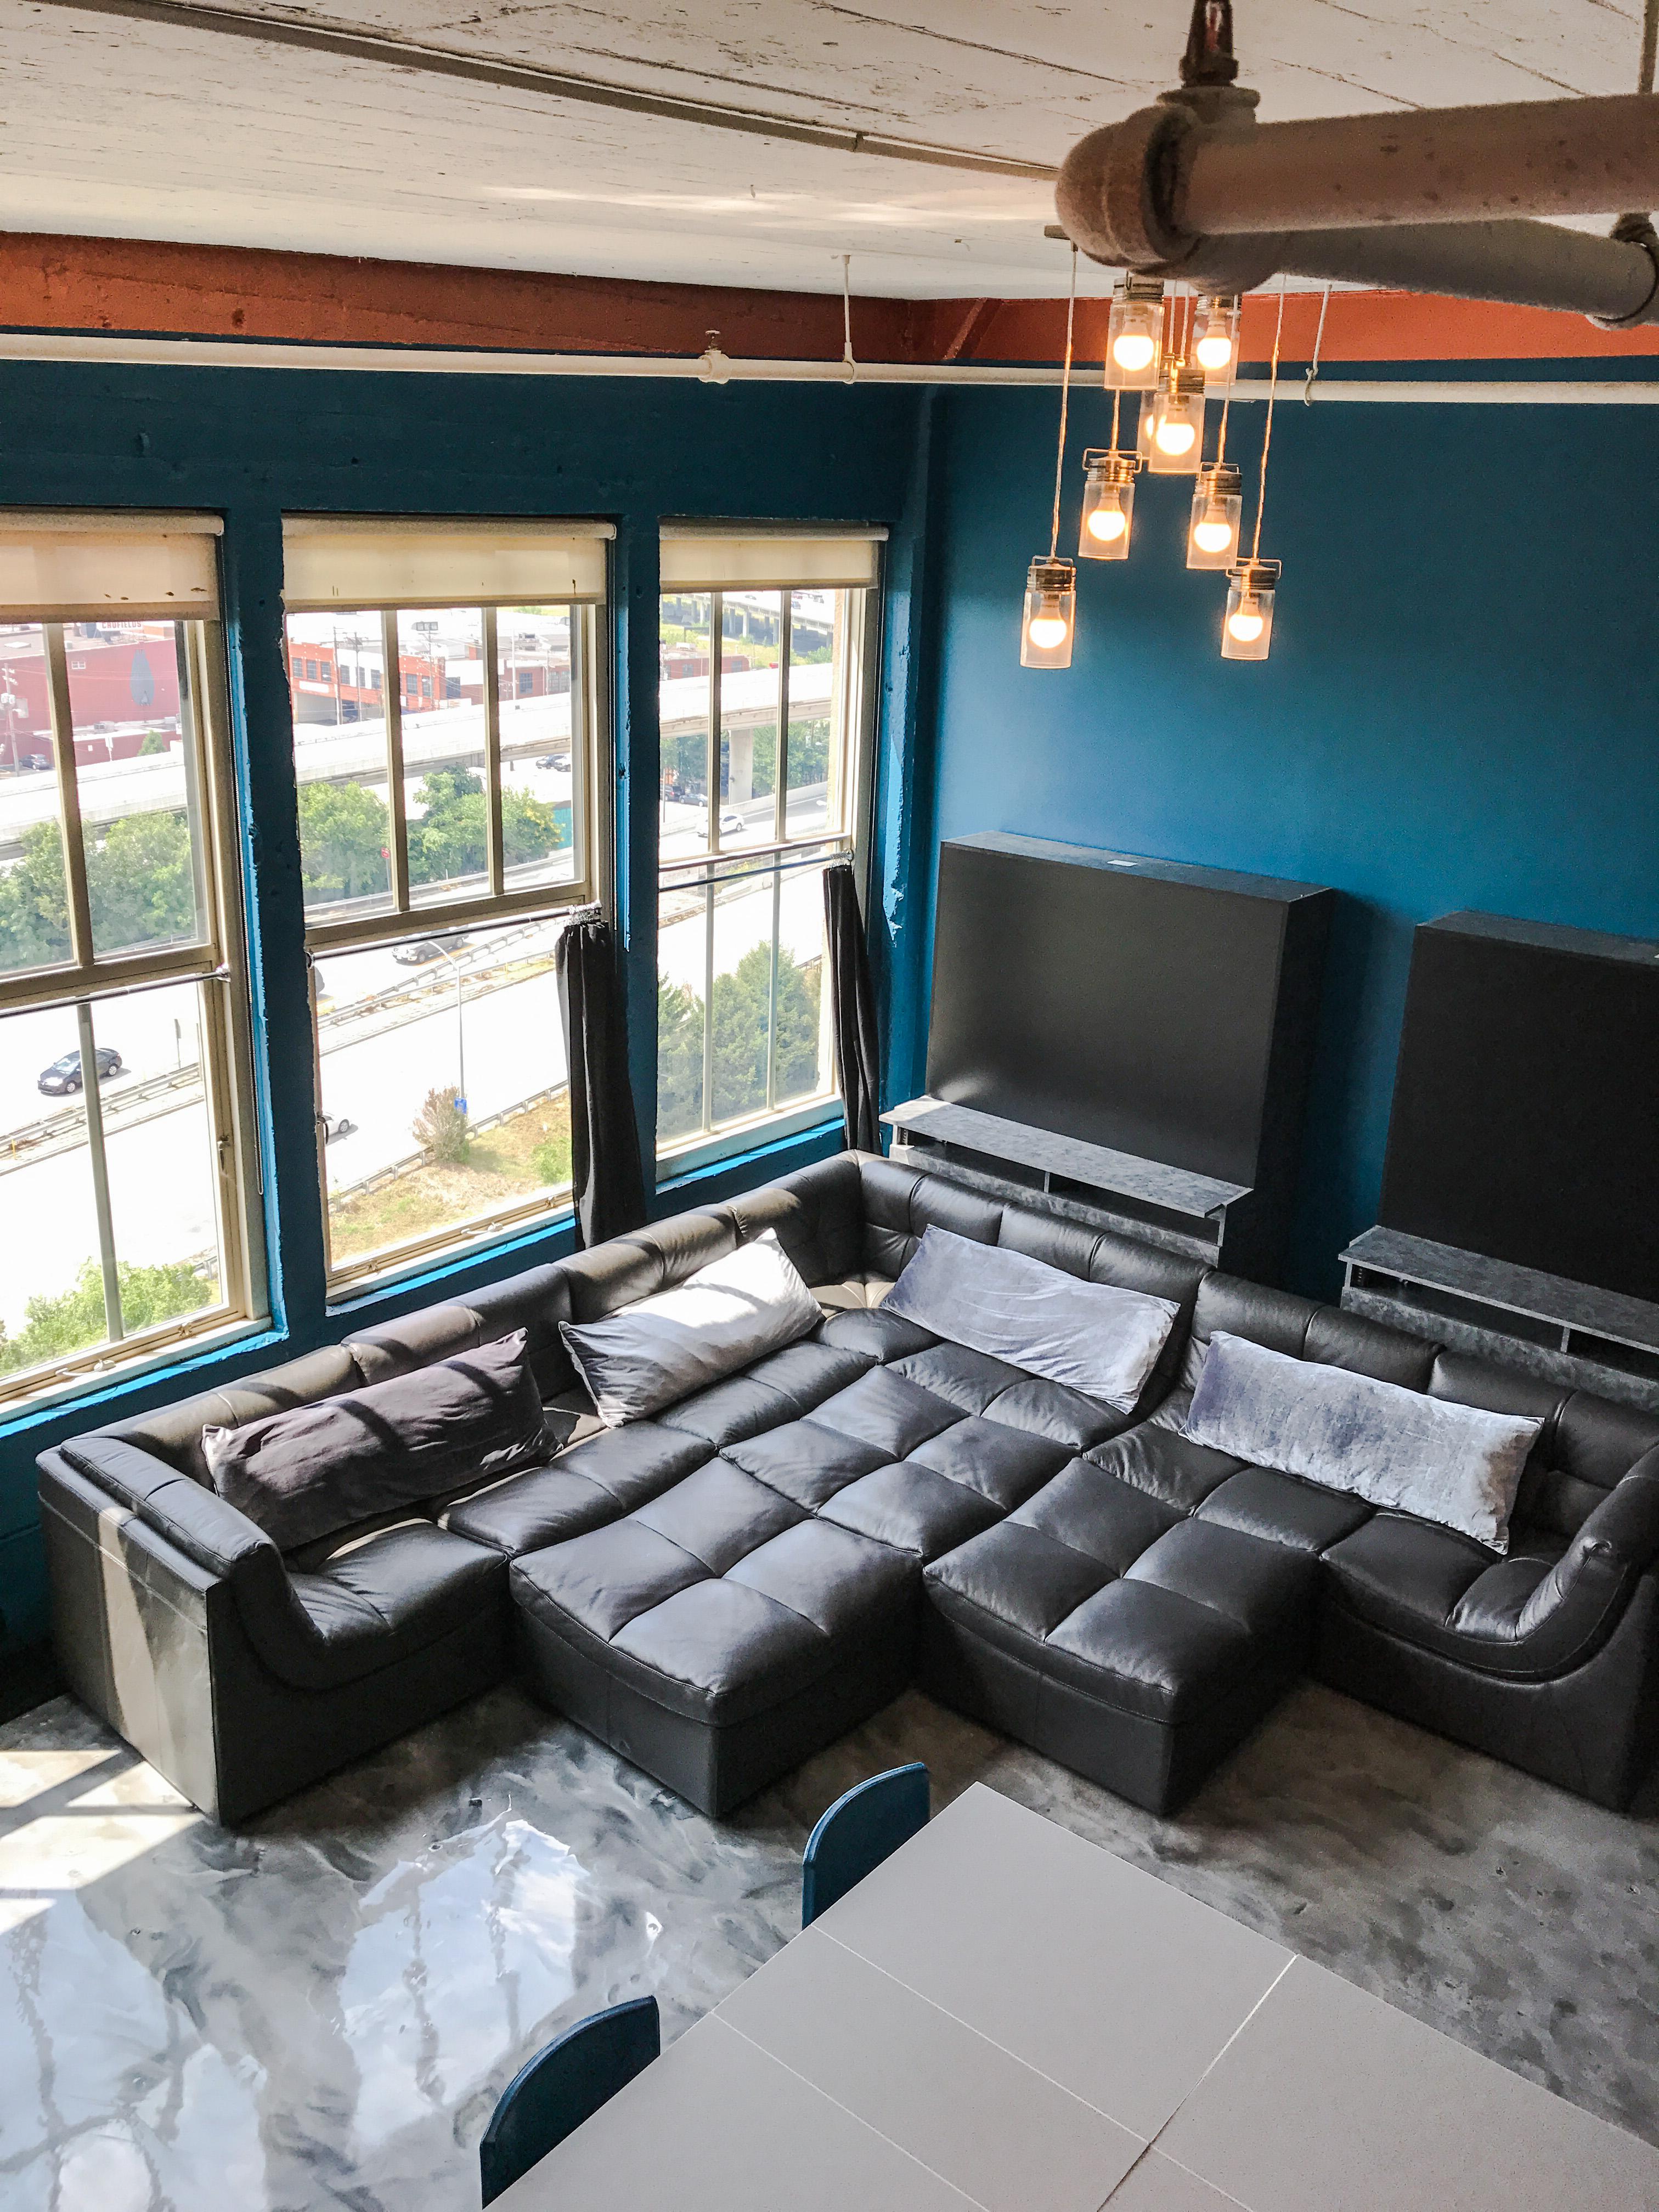 Loft Reverie Hotel 806 - As comfy as home +  Cloud Sofa + Dining + Birdseye + City and Floyds Knob H